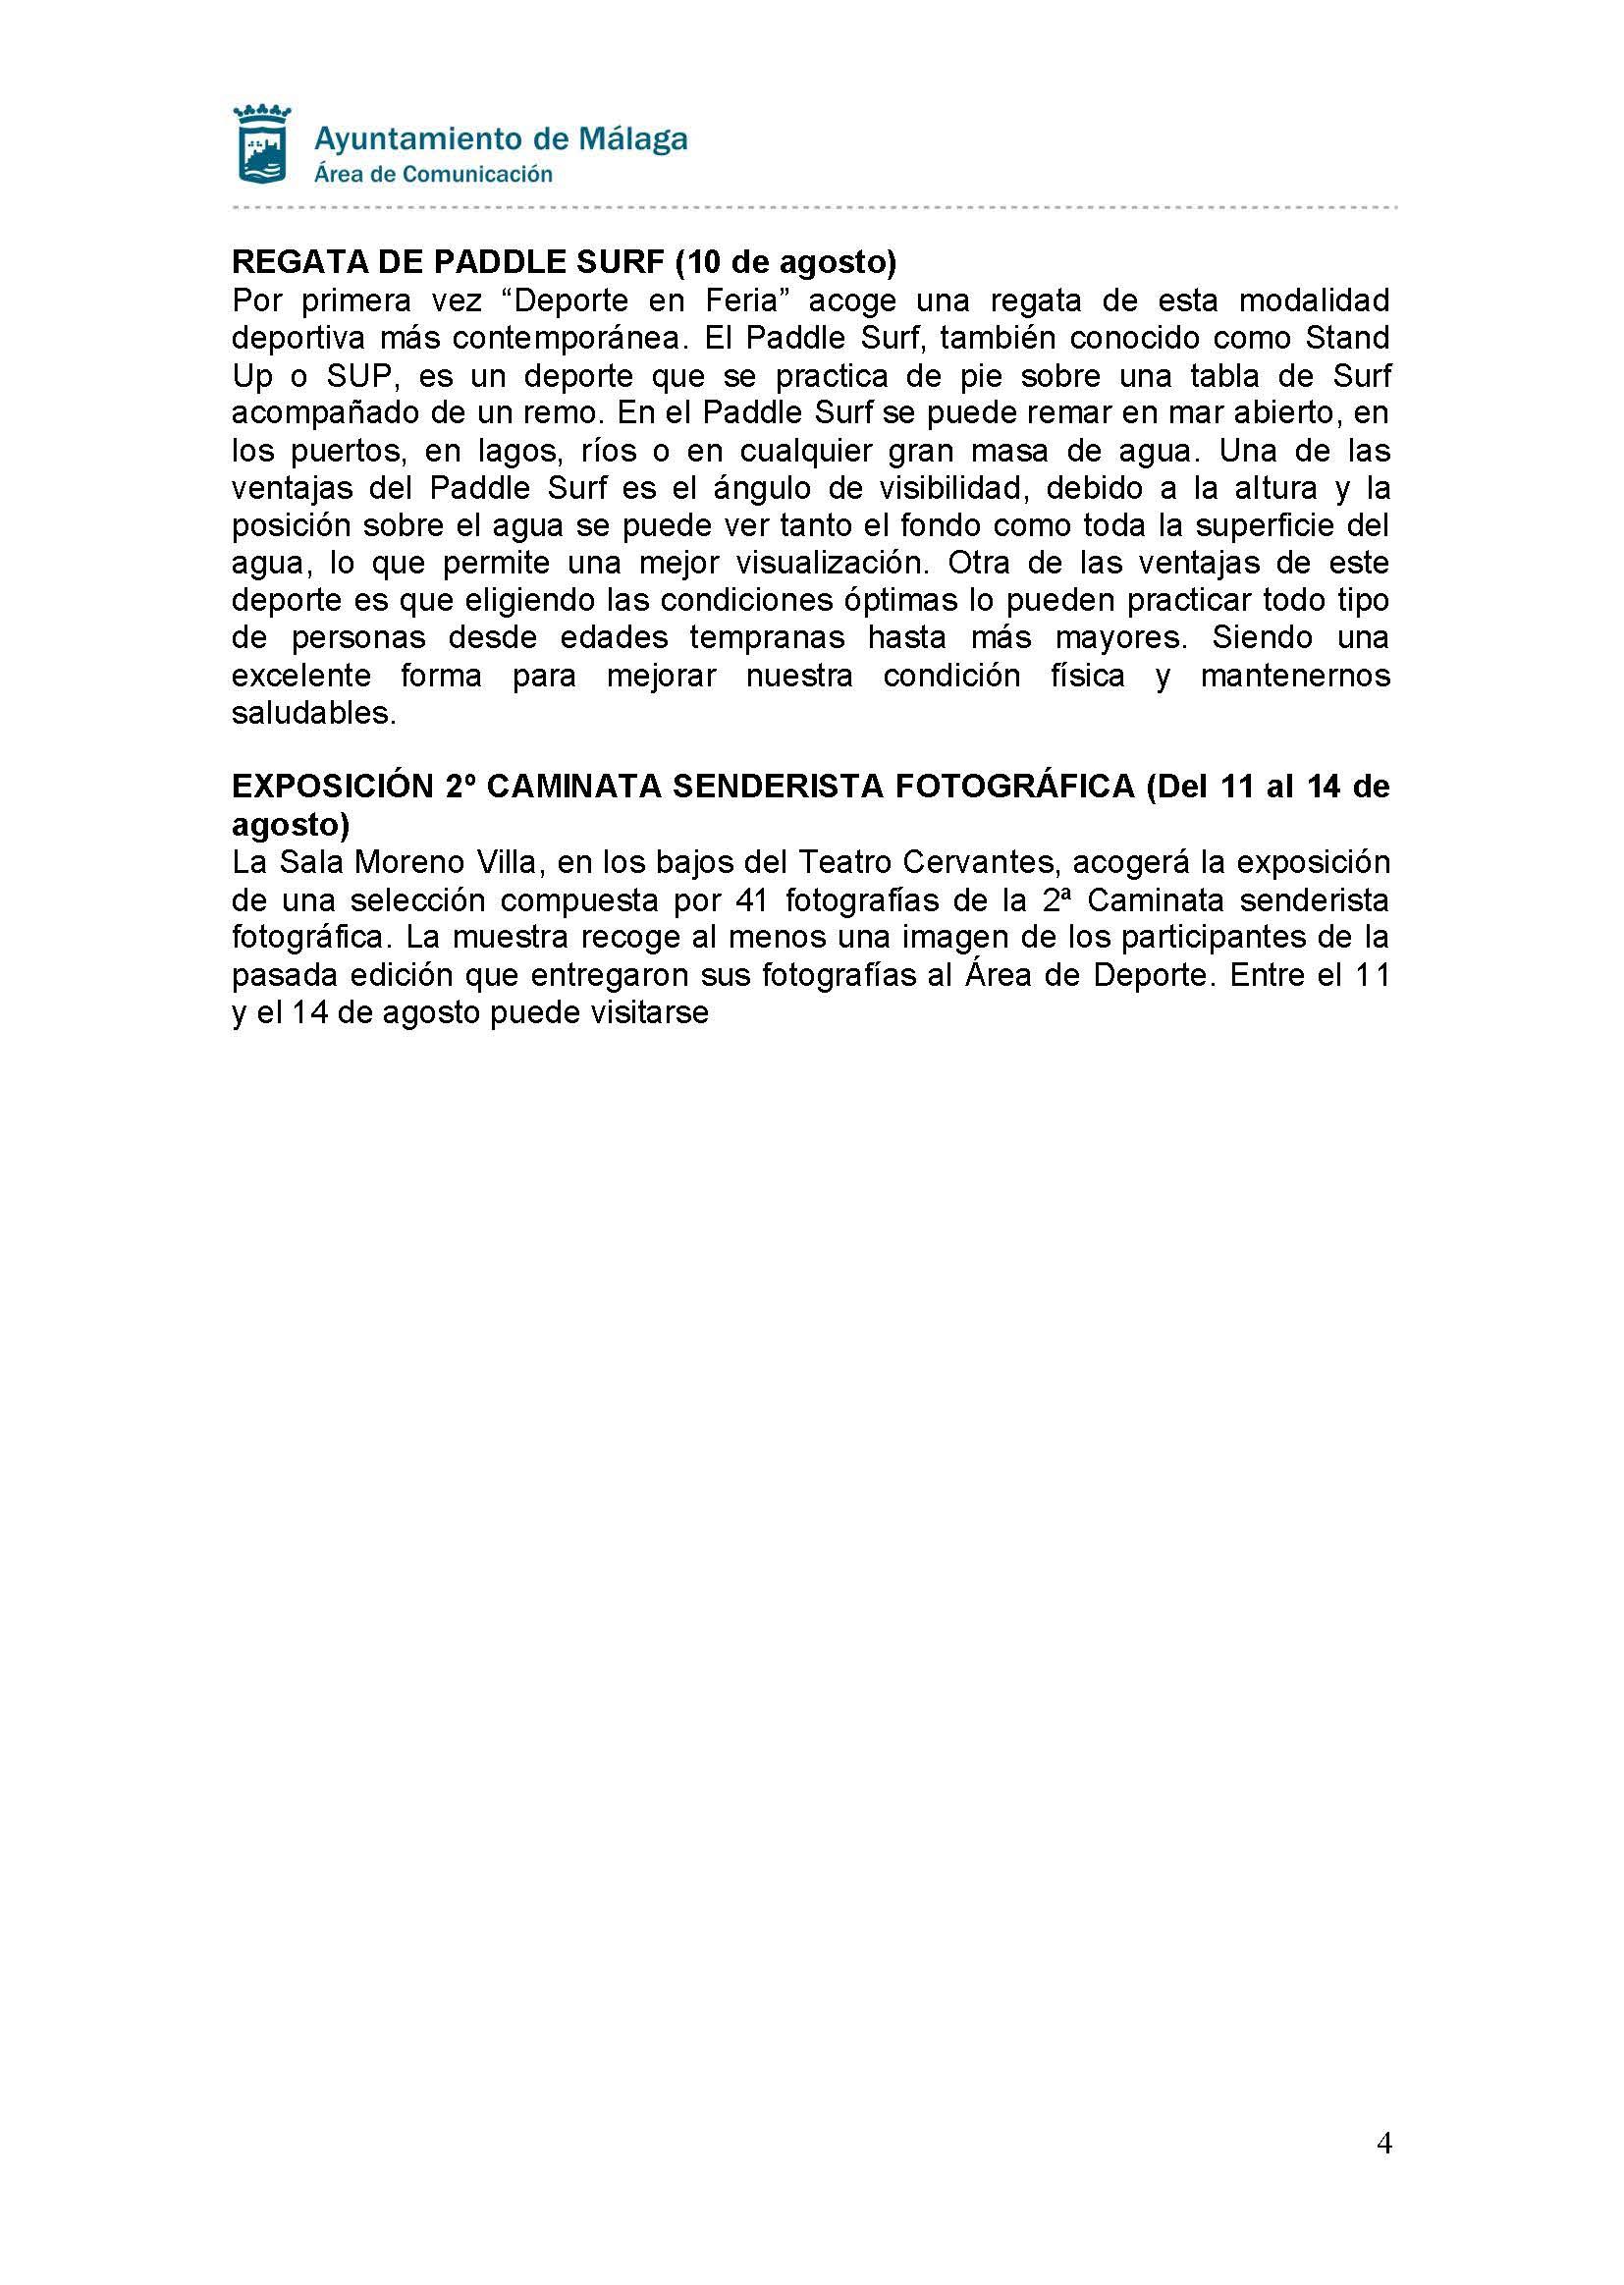 programa-deporte-feria-2014_Page_4